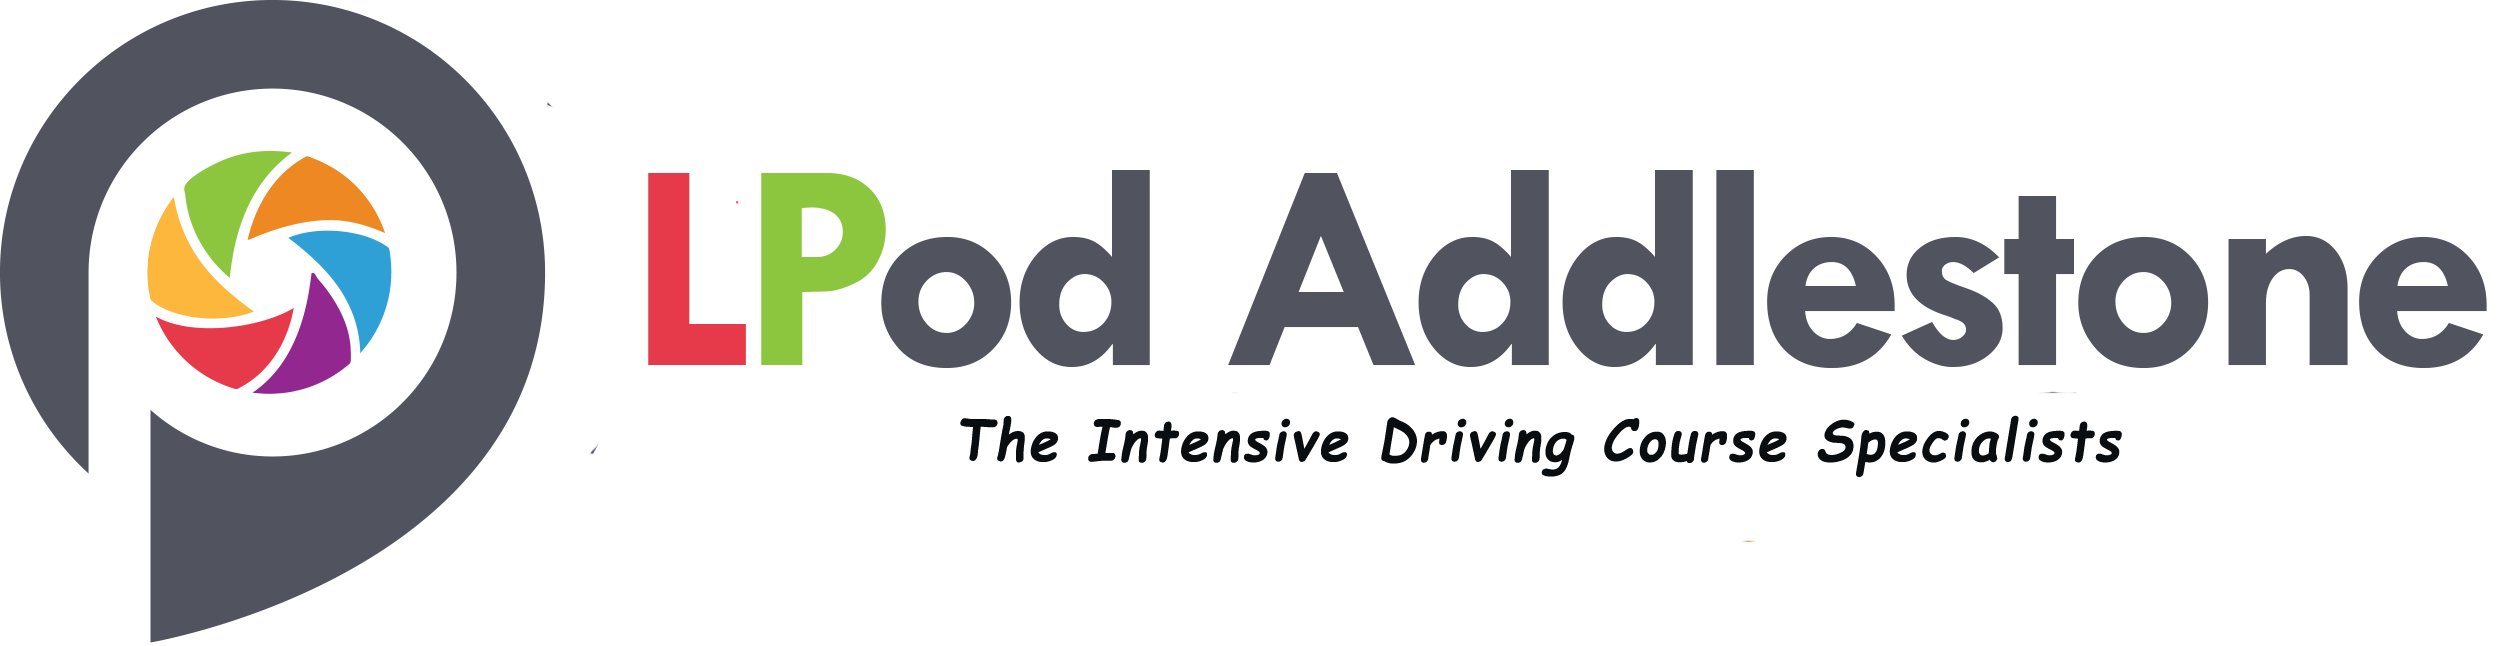 intensive driving coruses addletone, one week driving courses addlestone, crash driving courses addlestone. LPDO Academy Addlestone